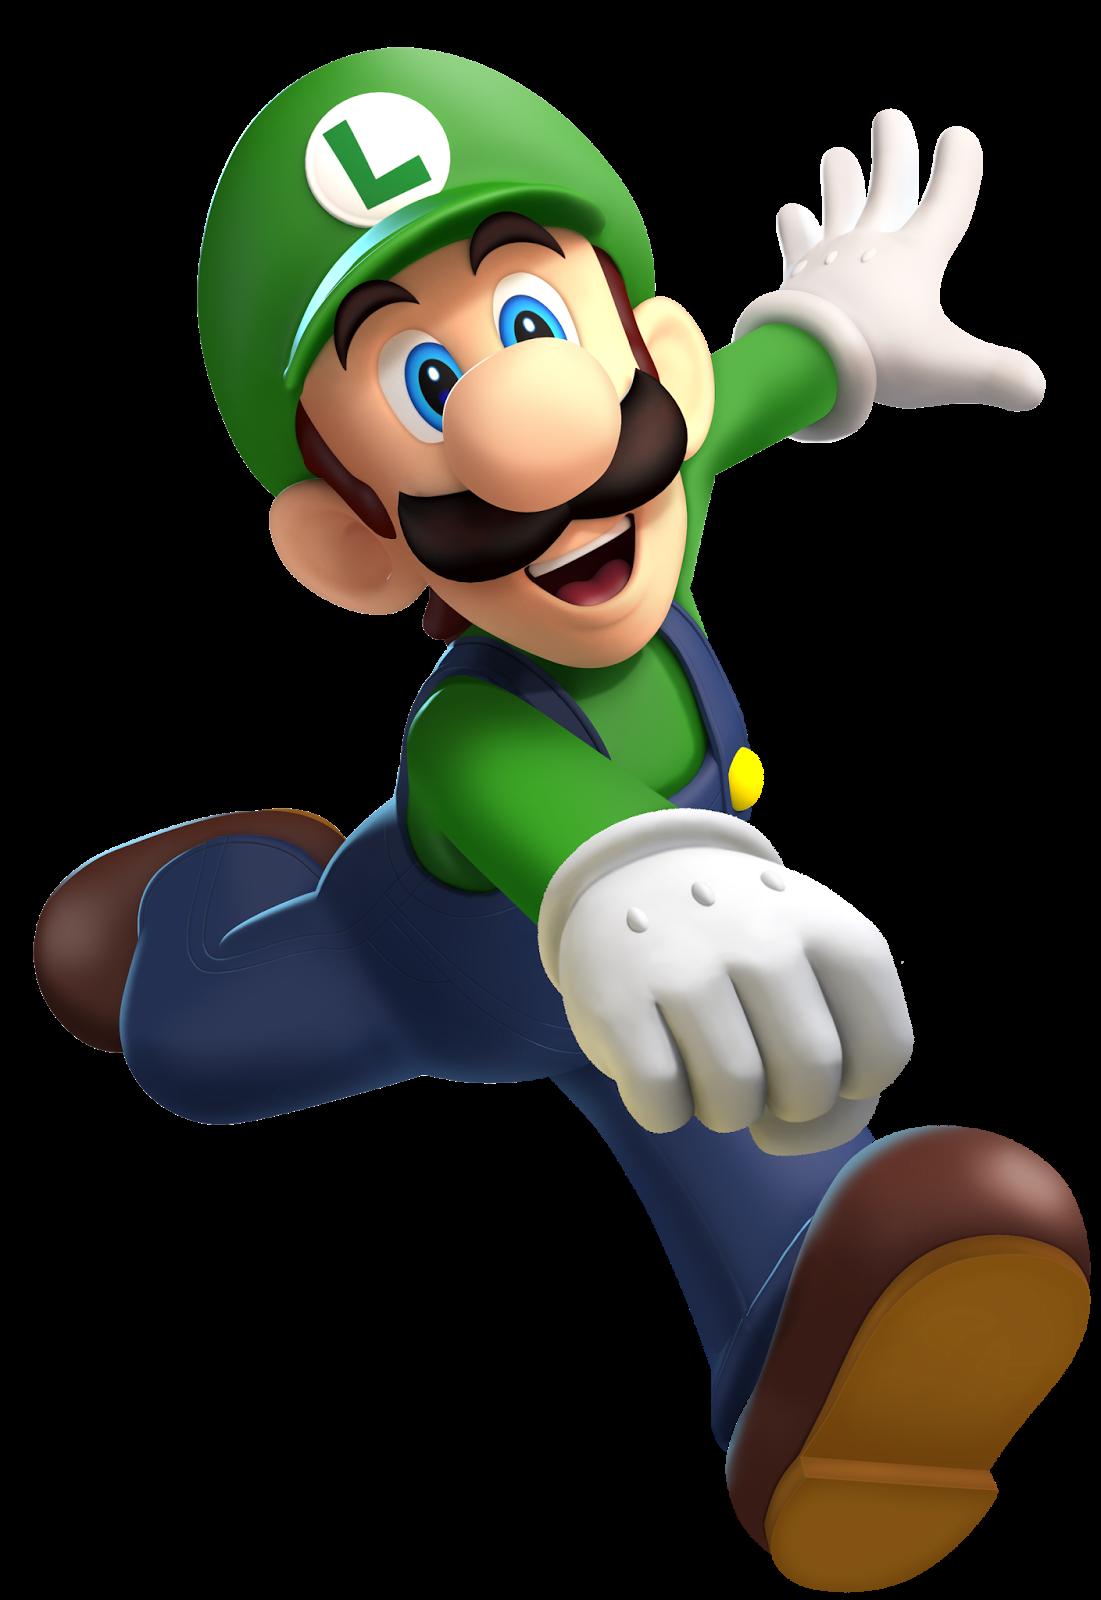 Ficheiro:Luigi.png